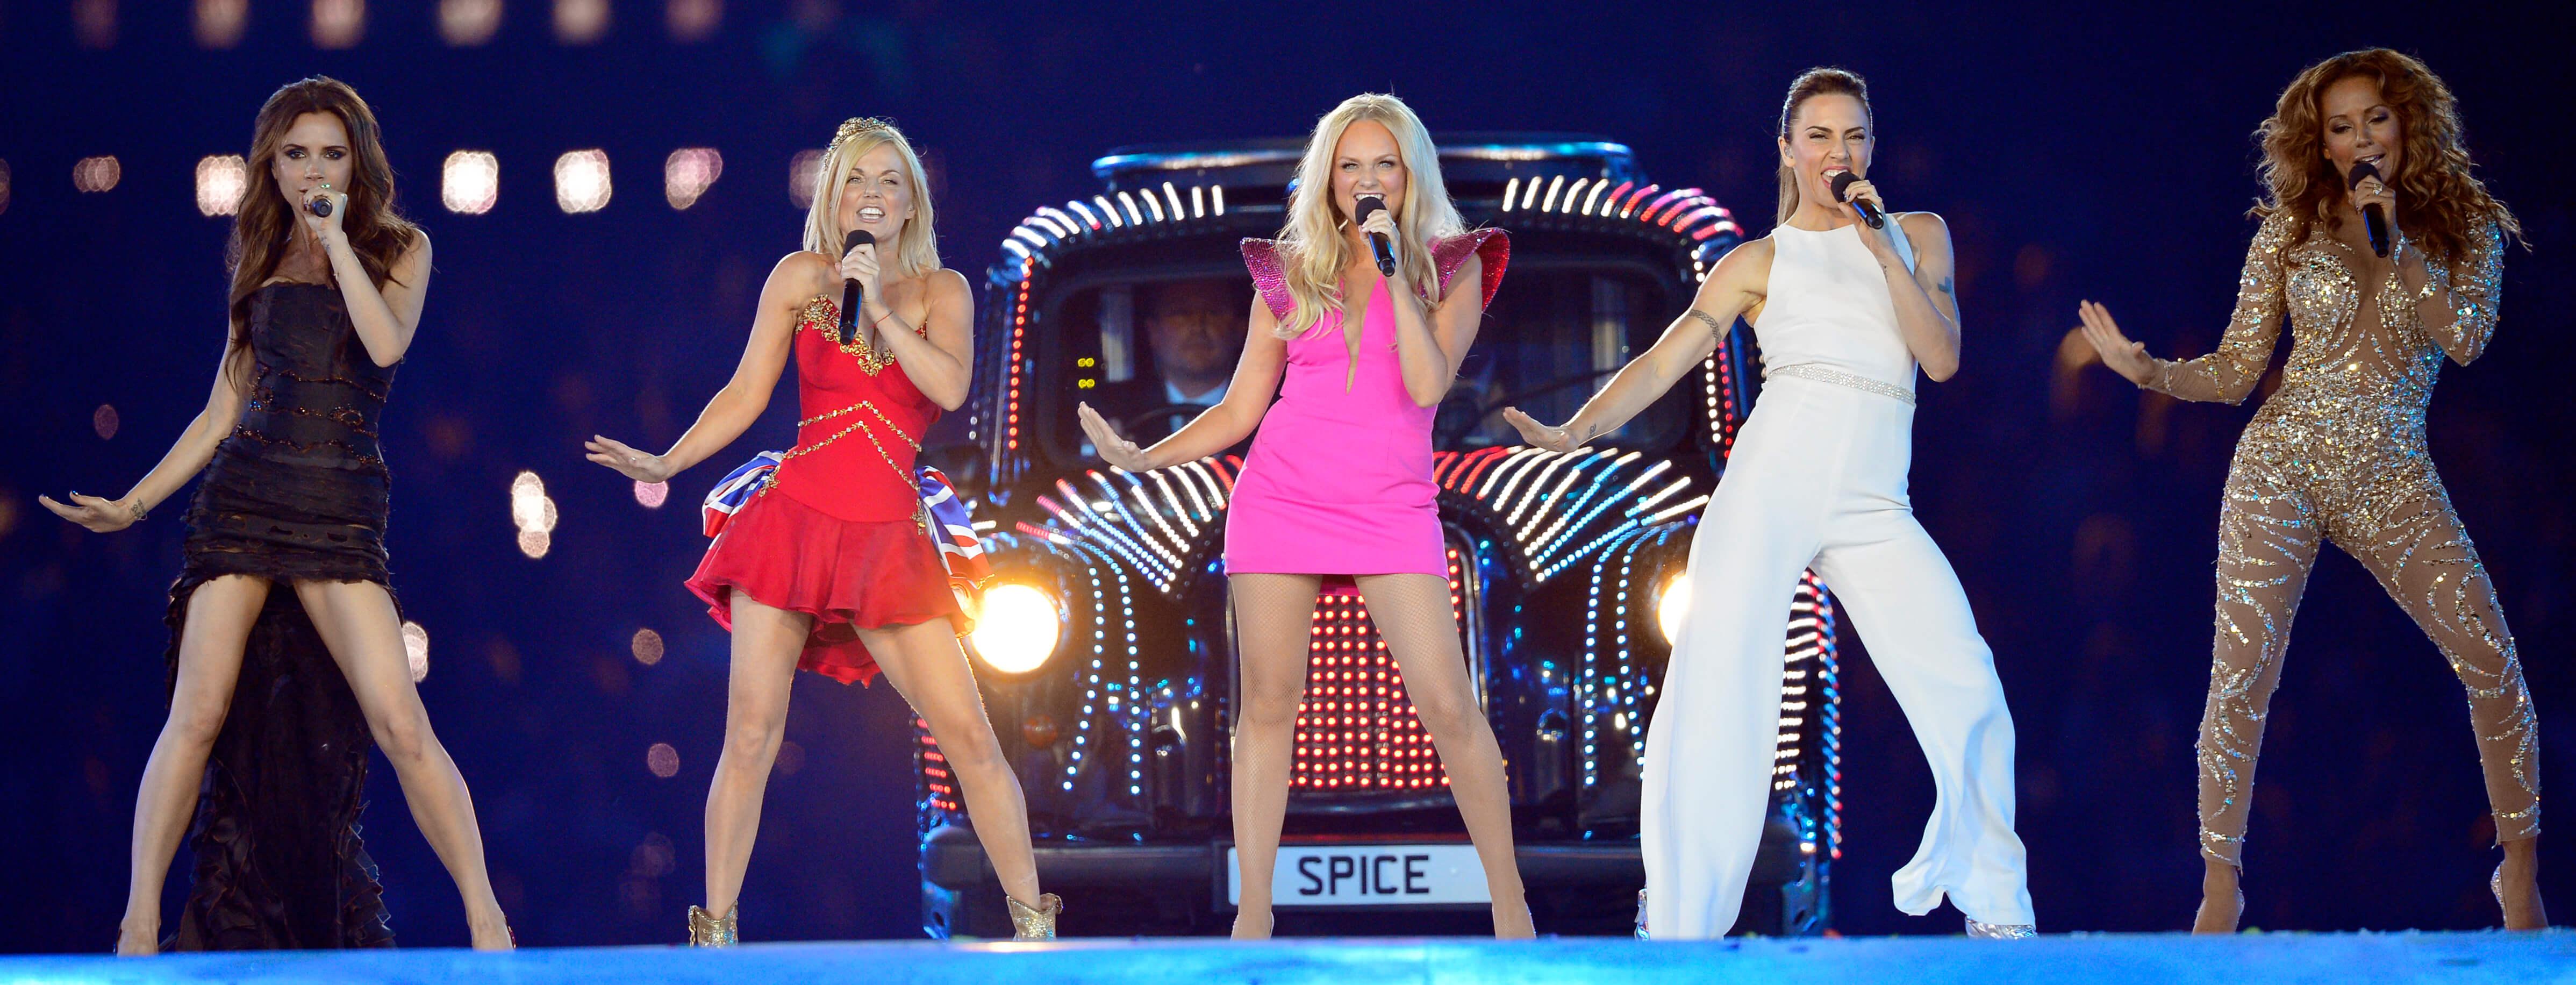 Spice_GIRLS_LONDON_OLYMPICS